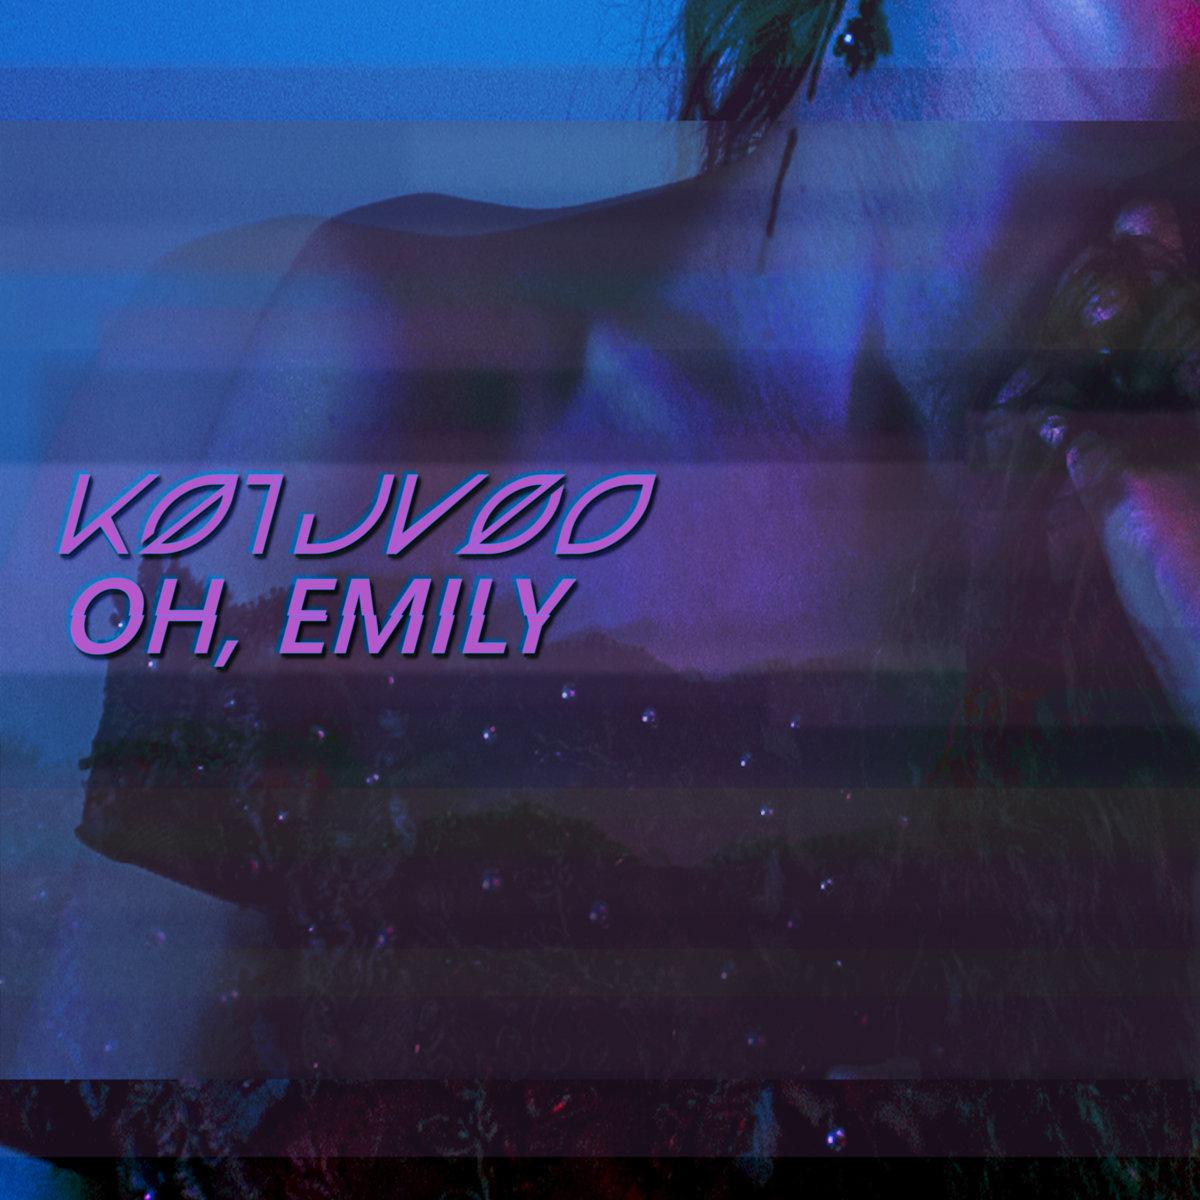 Katu Veo - Oh, Emily [single] (2019)